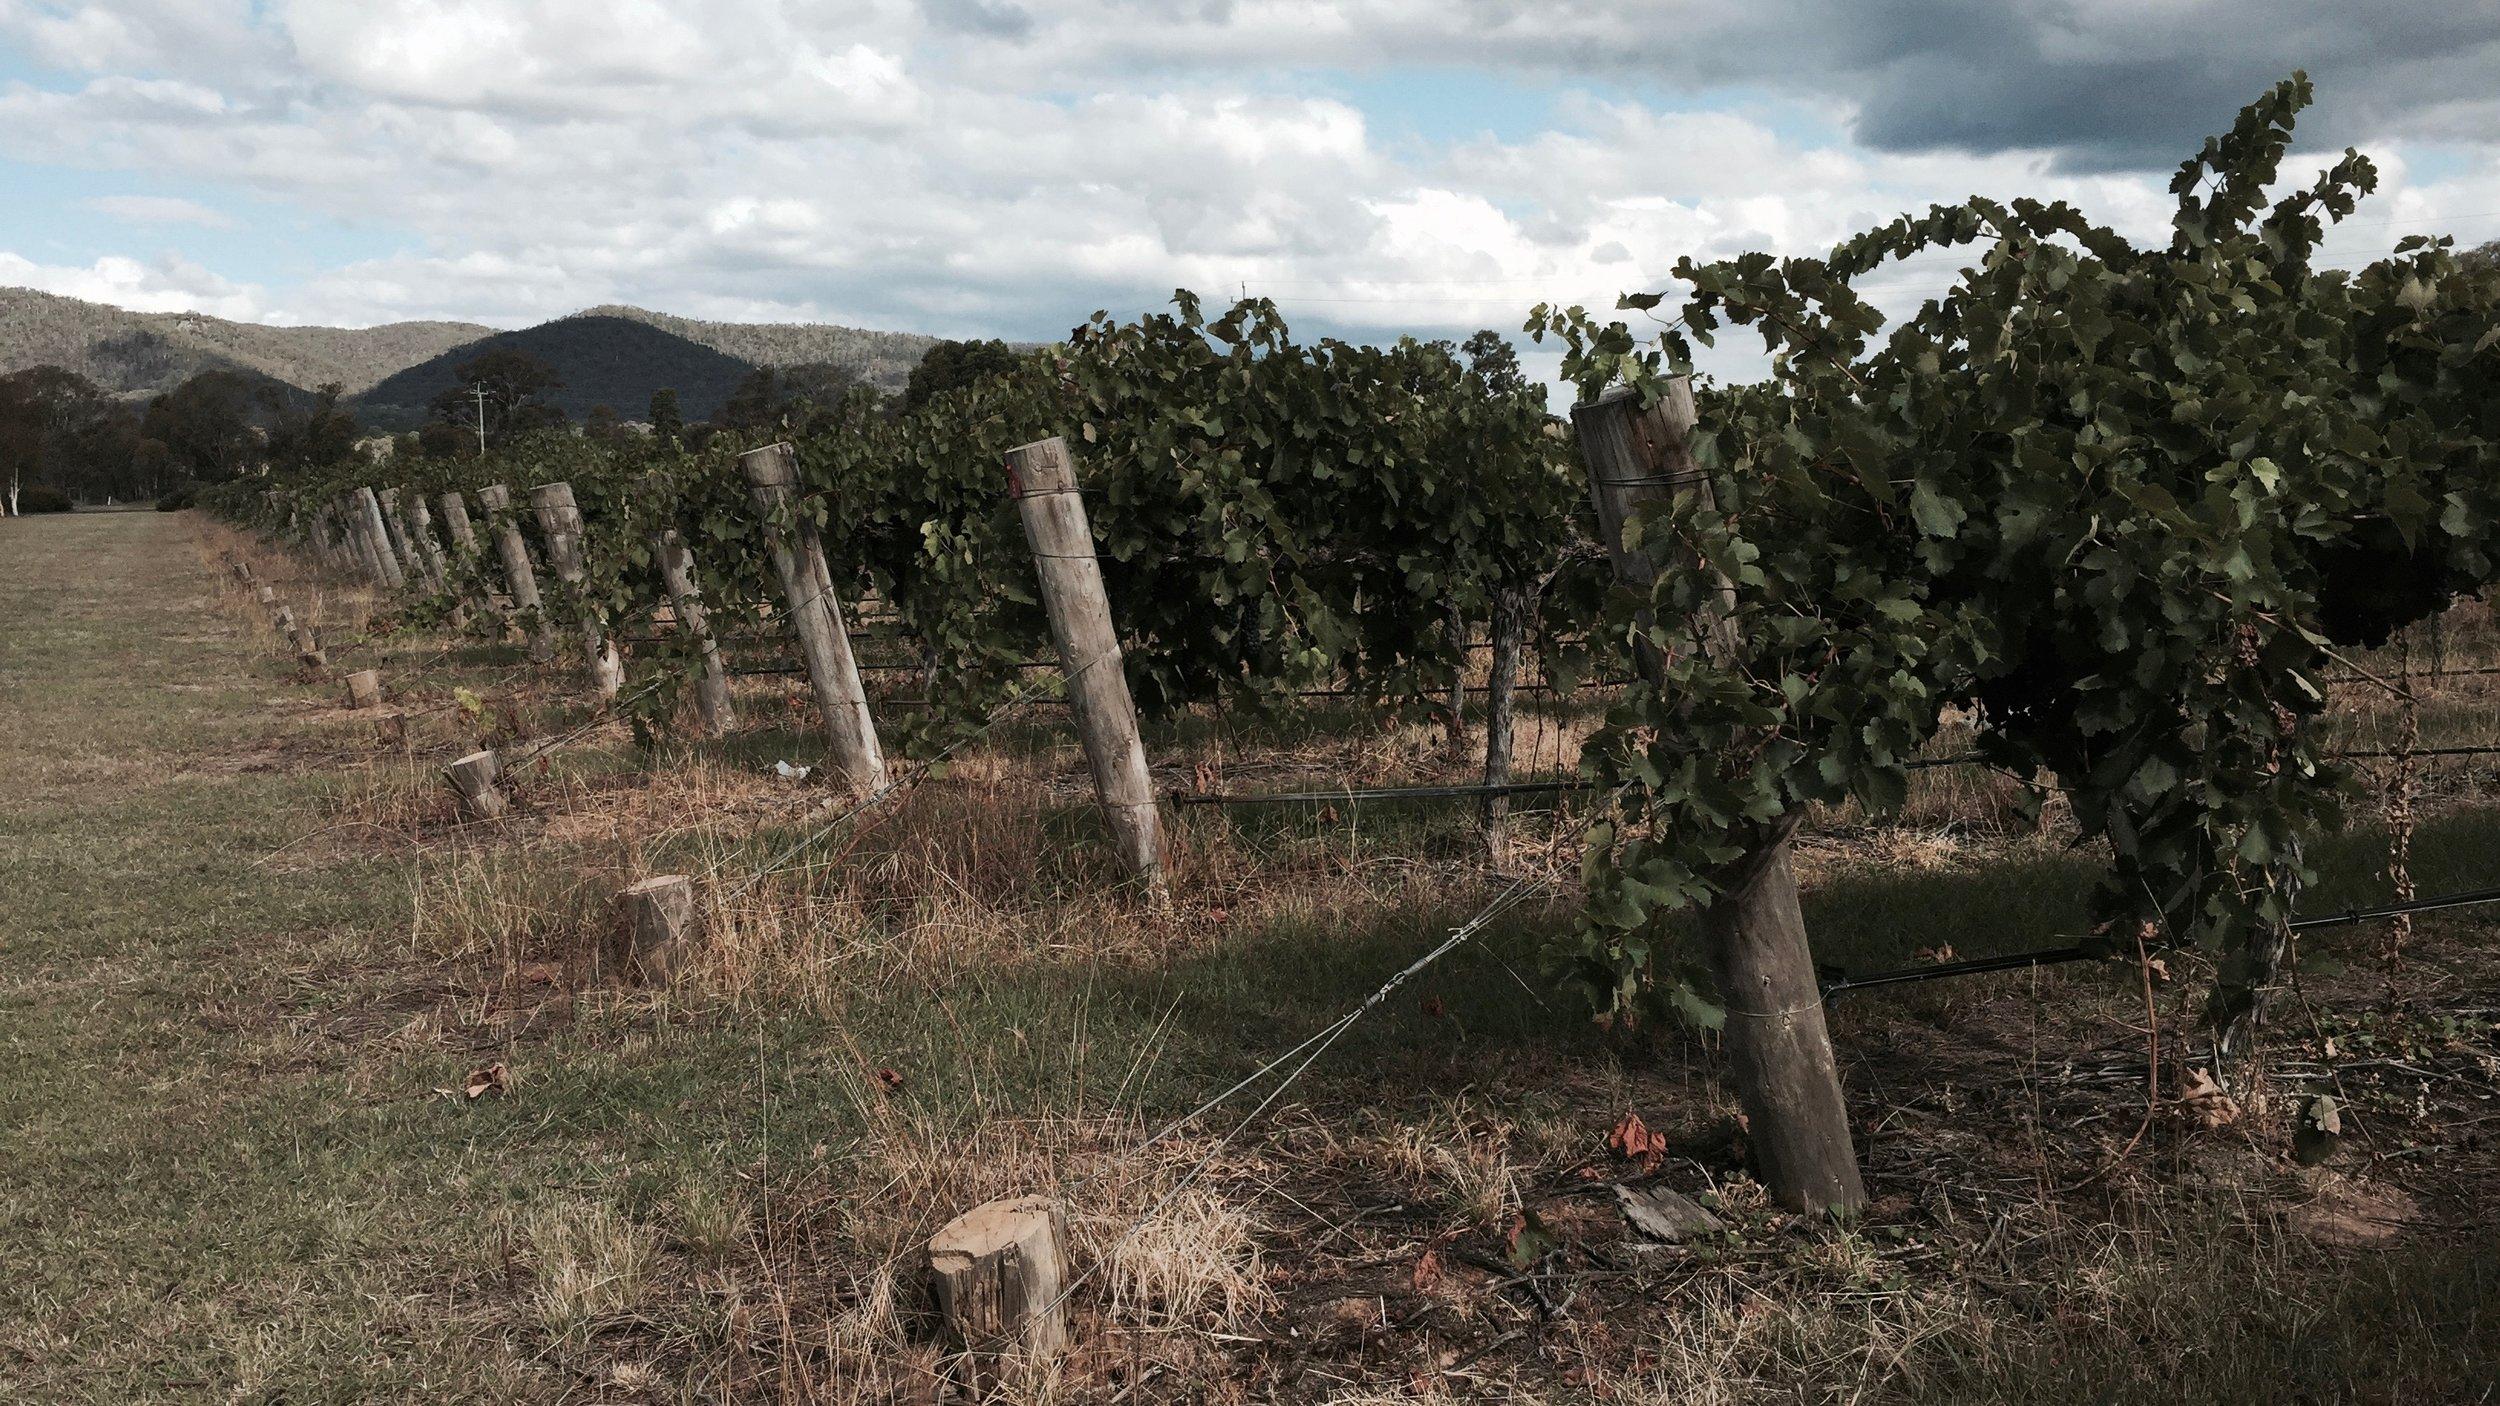 Vineyard Spring in Central NSW